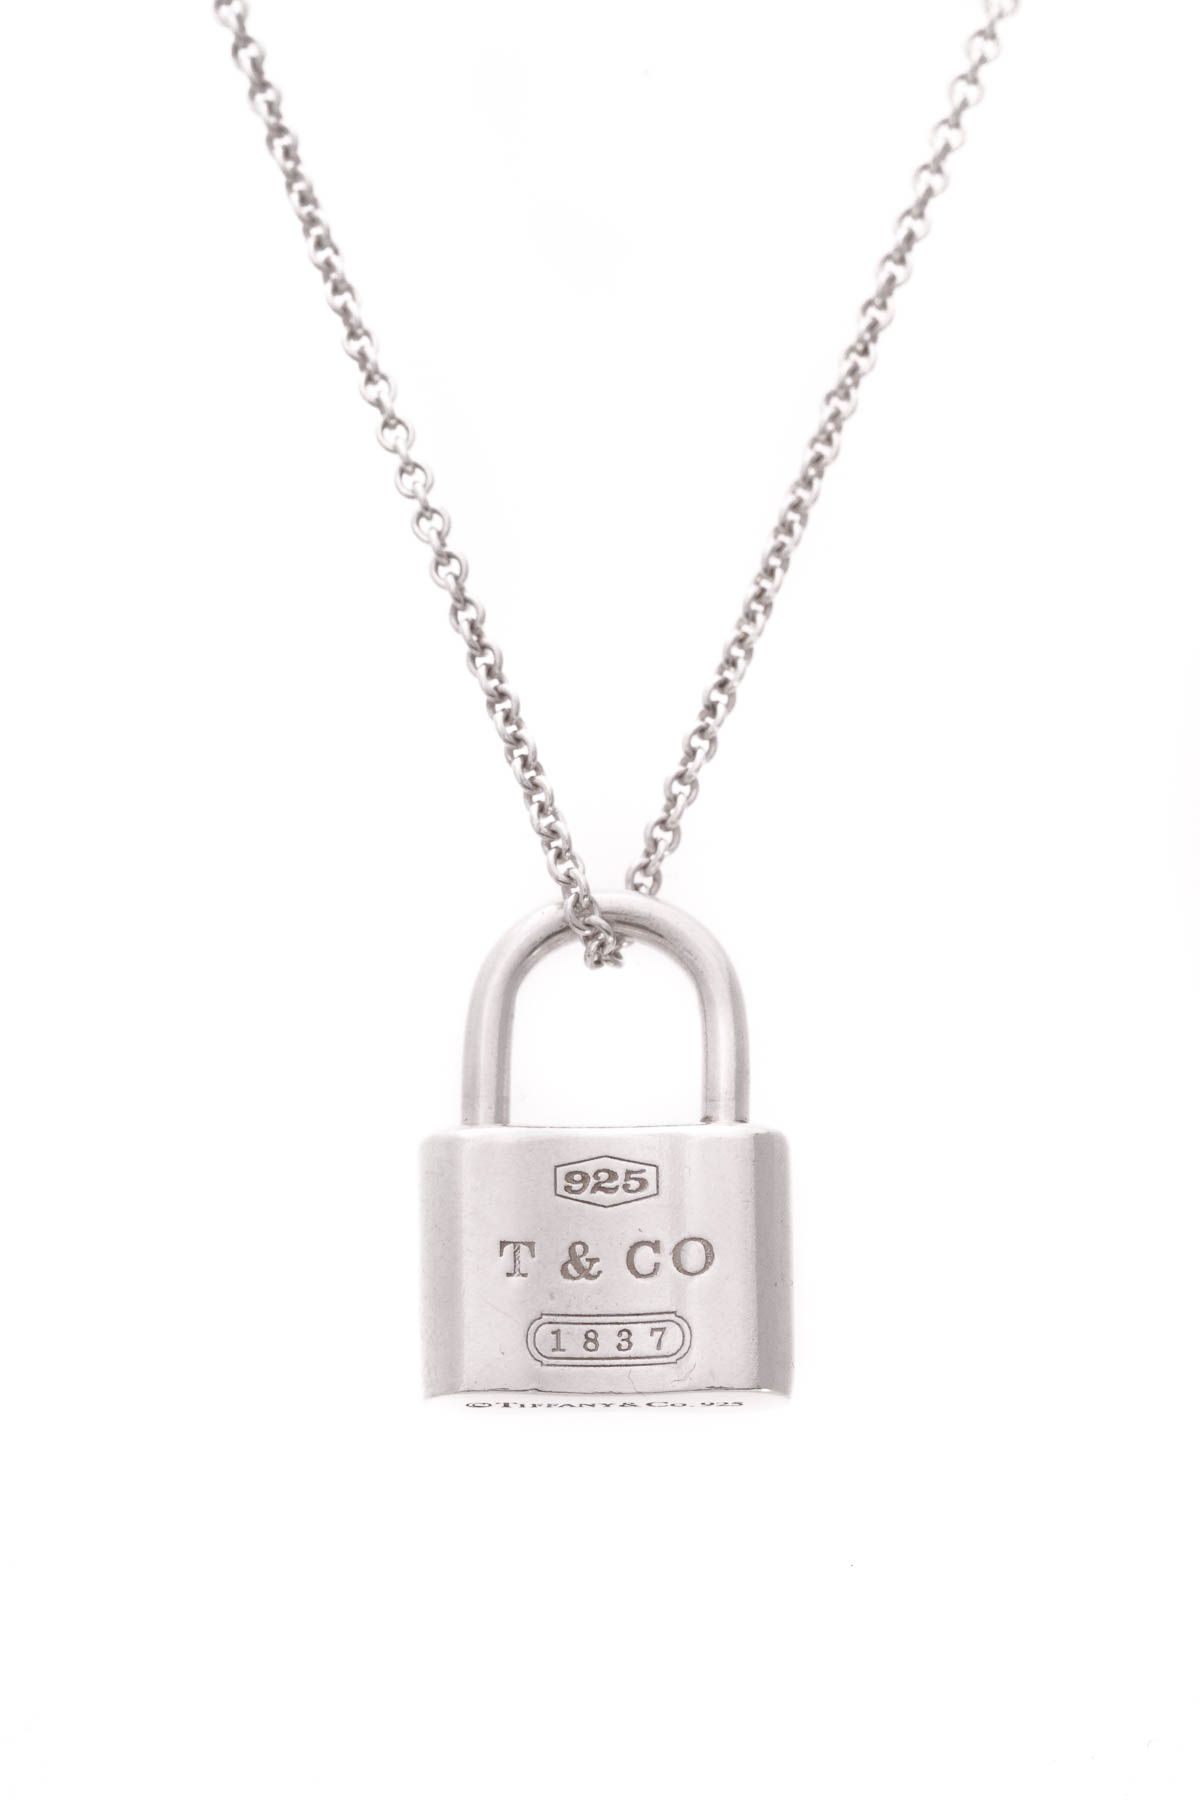 0bf3b94649e0a Tiffany & Co. 1837 Lock Pendant Necklace | Timeless Tiffany & Co. in ...